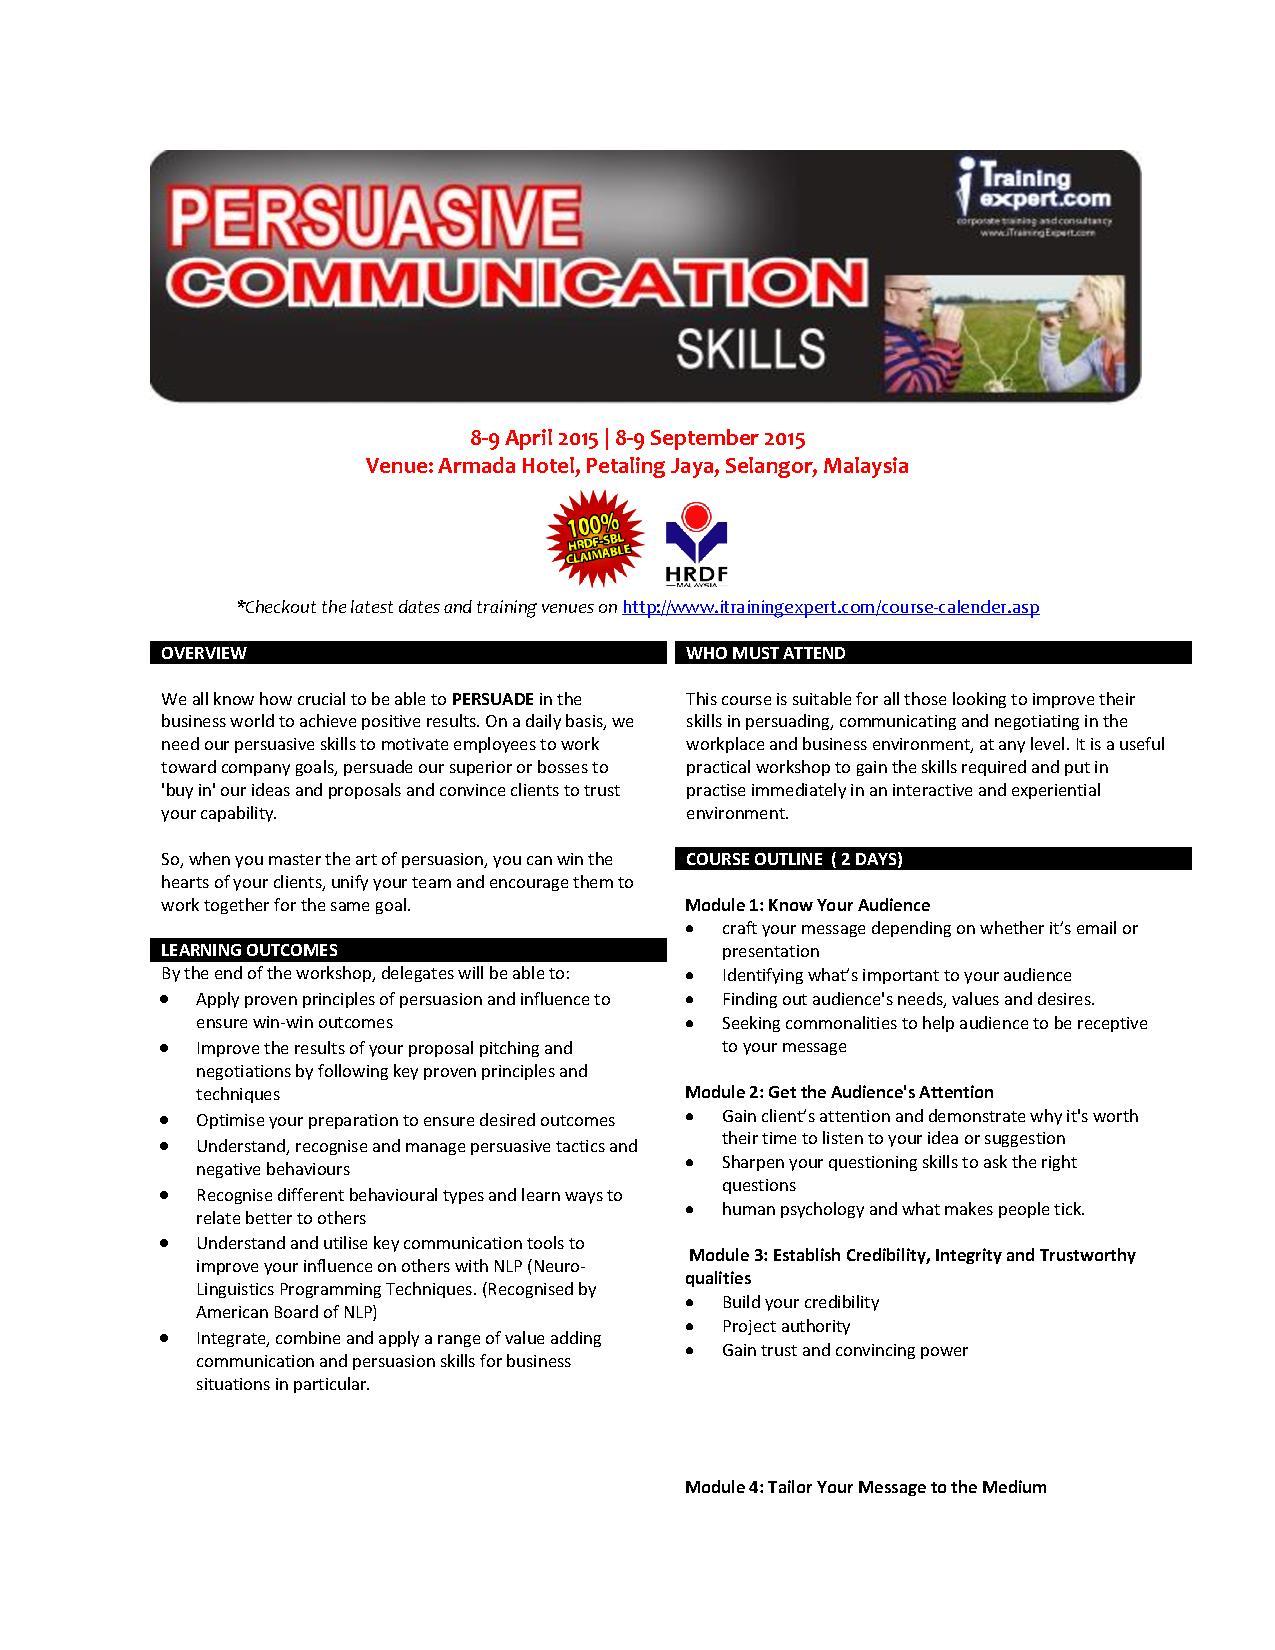 Persuasive Communication Skills Public Program By